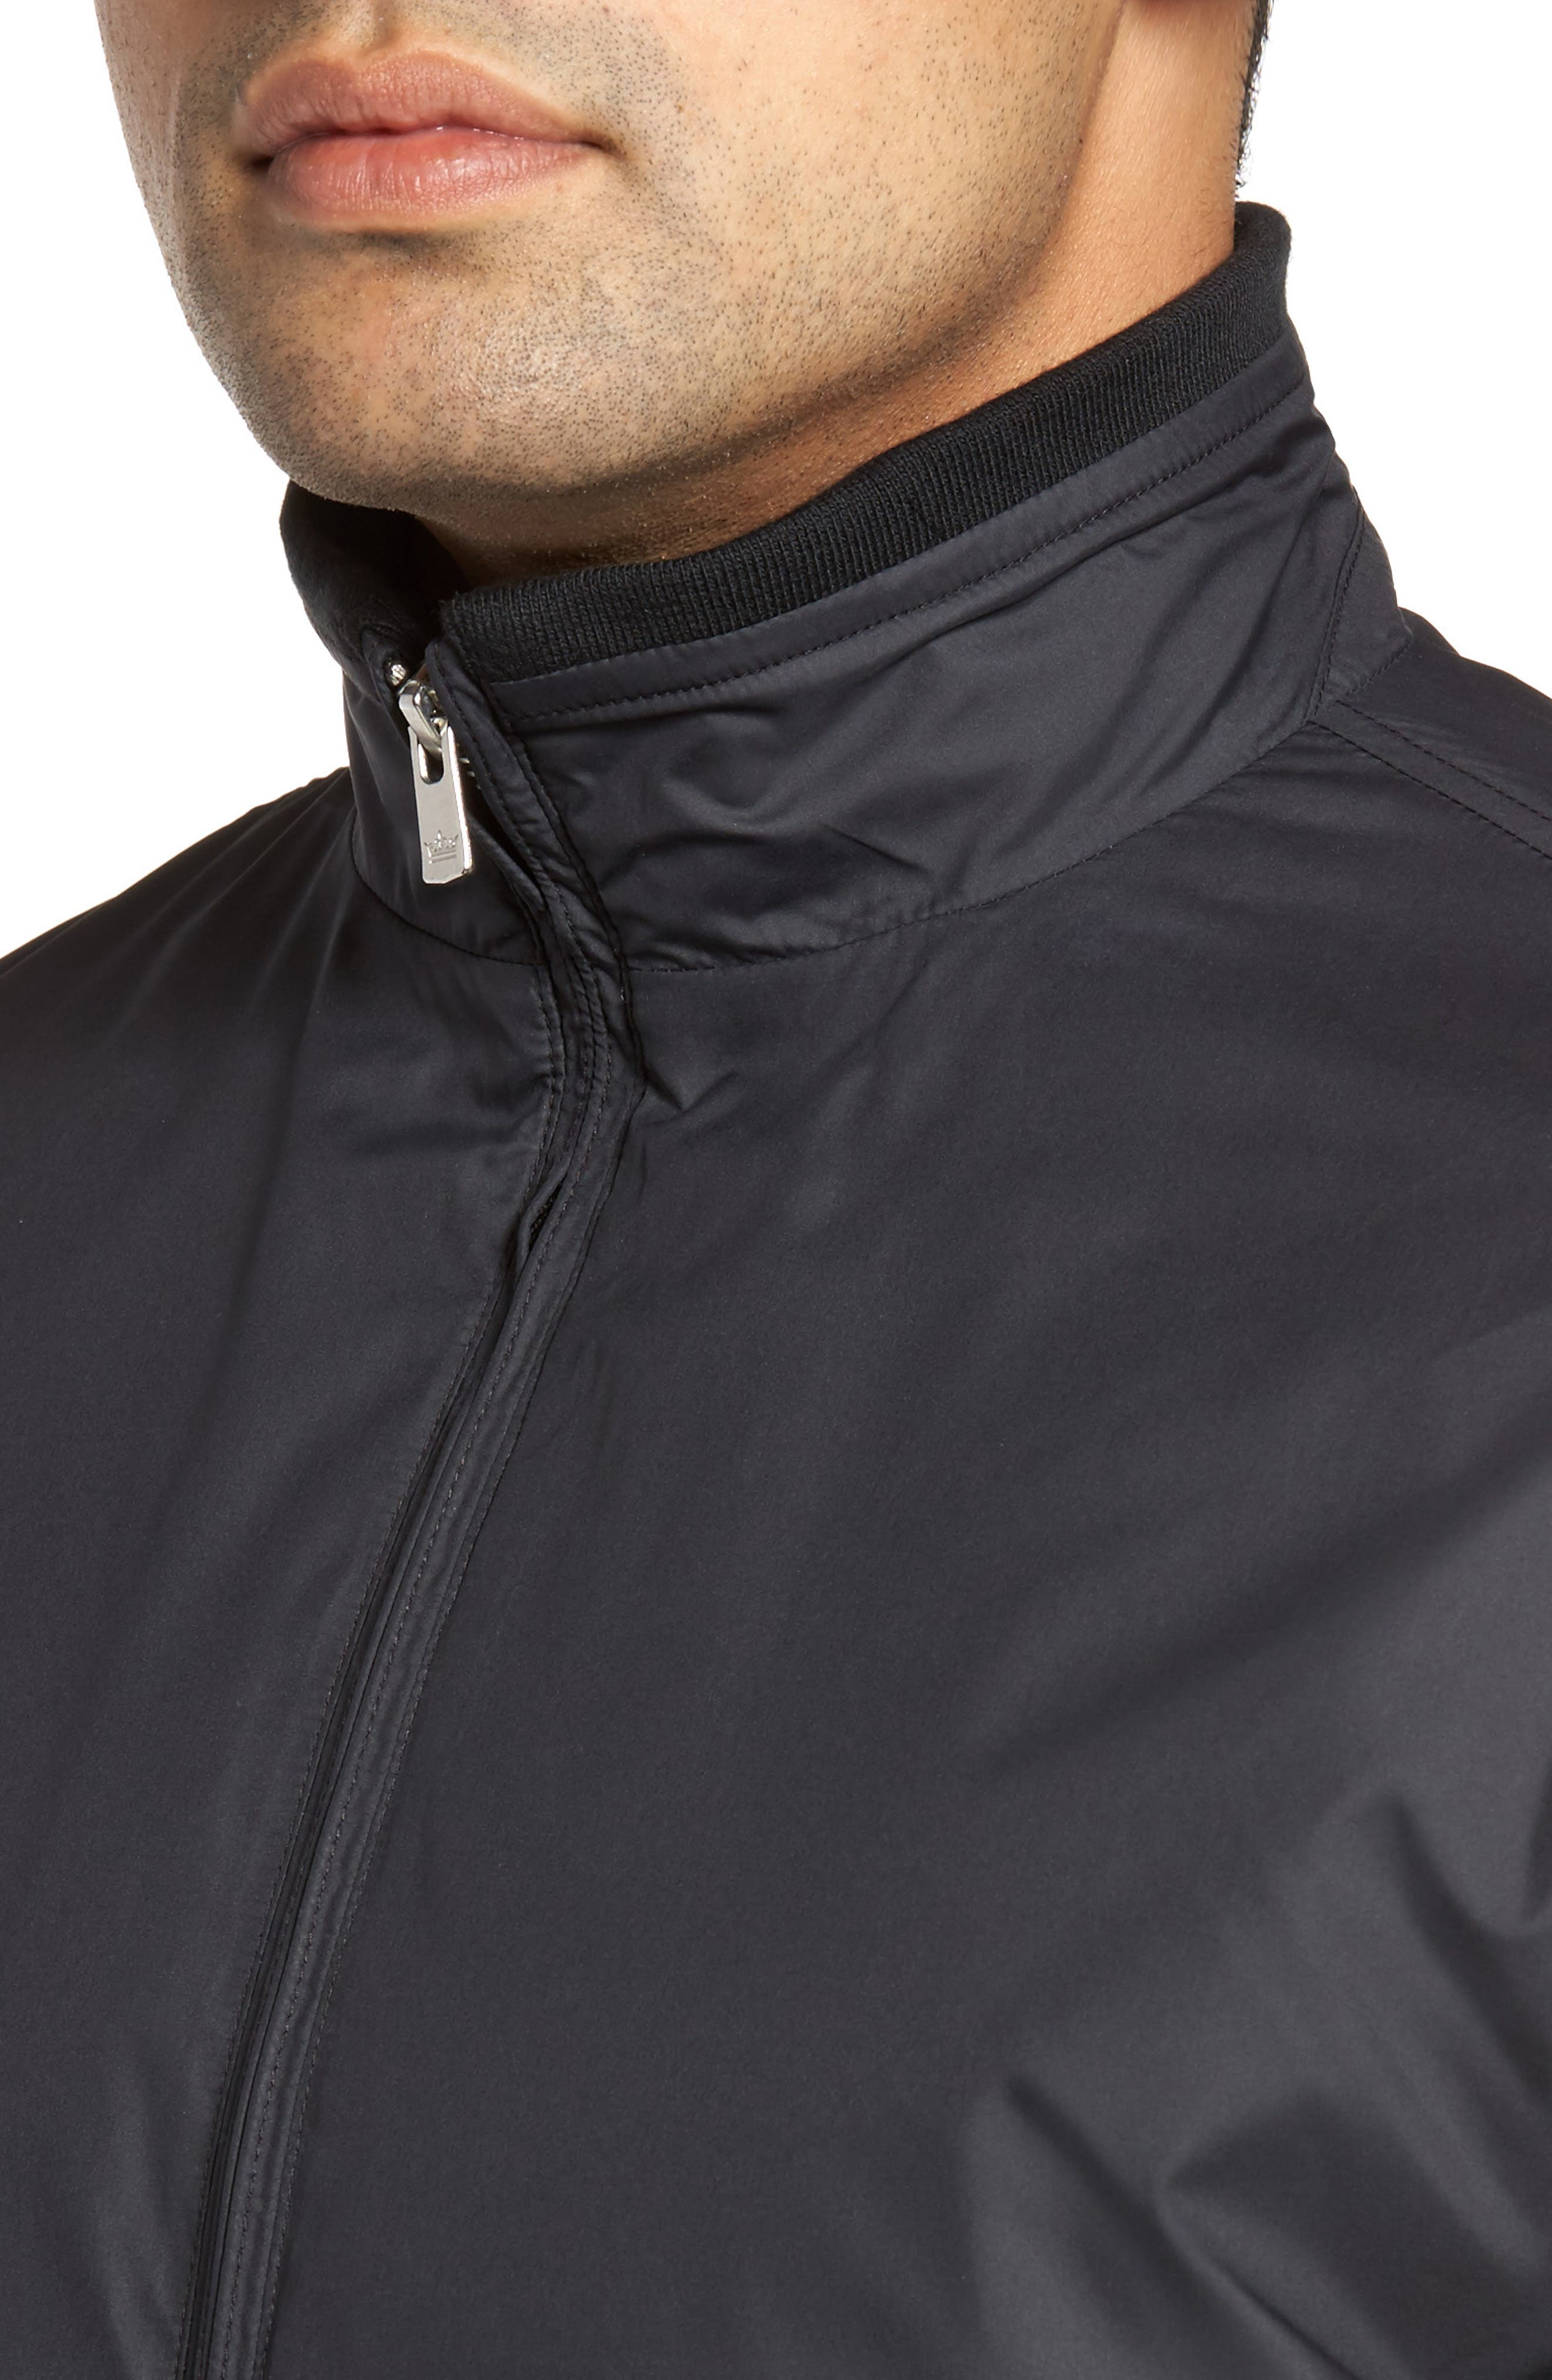 PETER MILLAR, Zip Jacket, Alternate thumbnail 5, color, BLACK